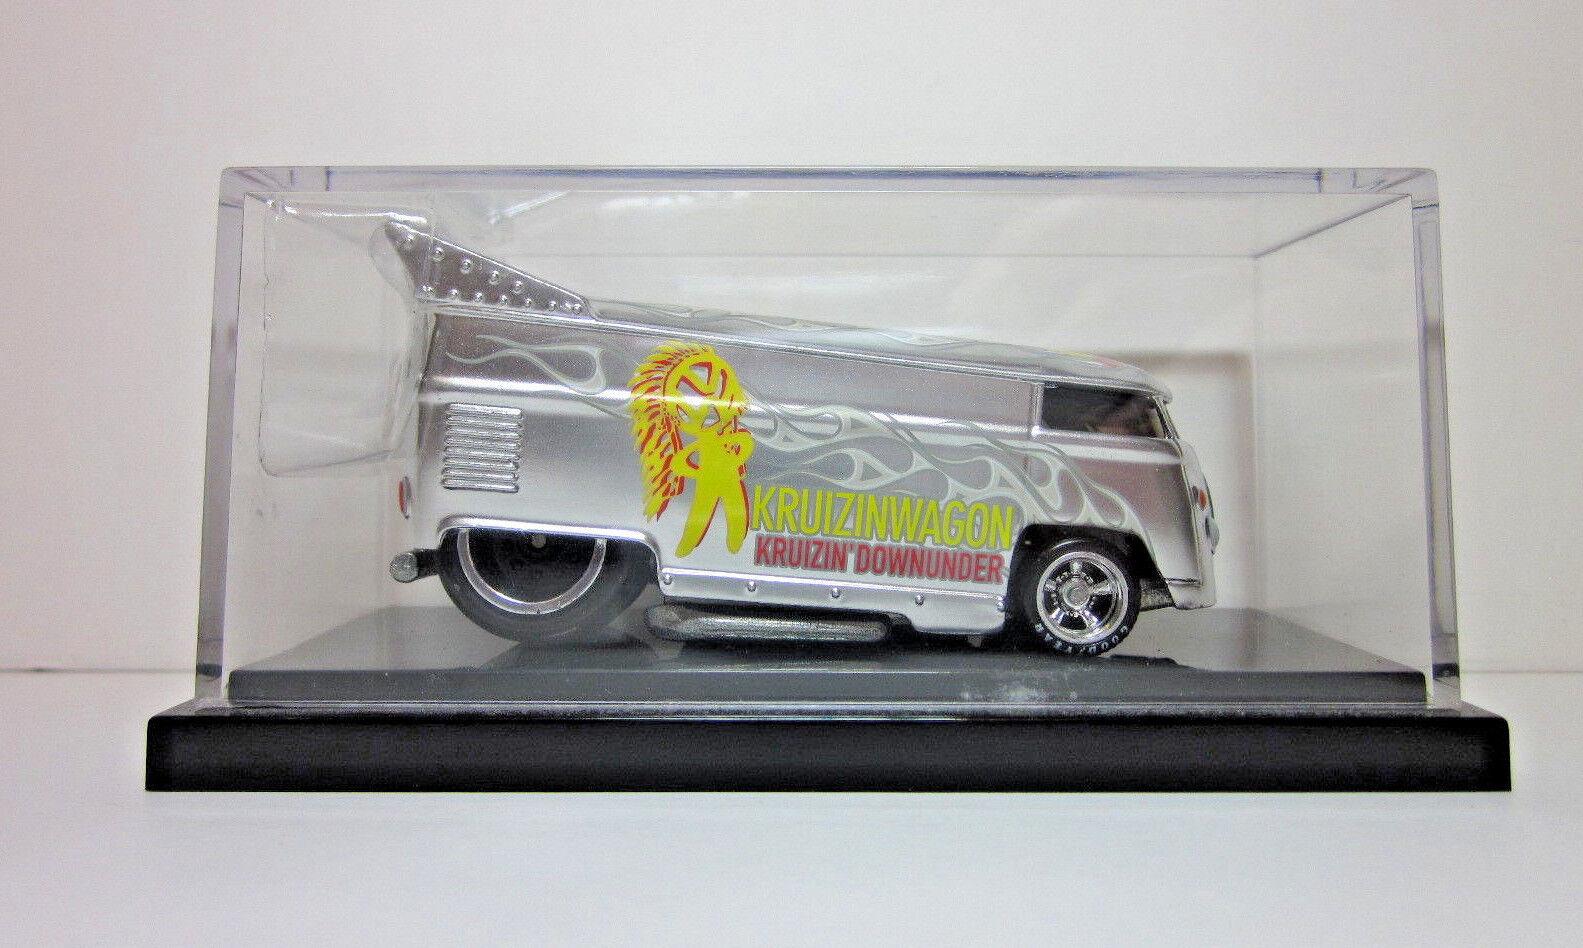 HOT WHEELS LIBERTY PROMOTIONS - Silber KRUIZINWAGON VW DRAG BUS - 165 of 1000